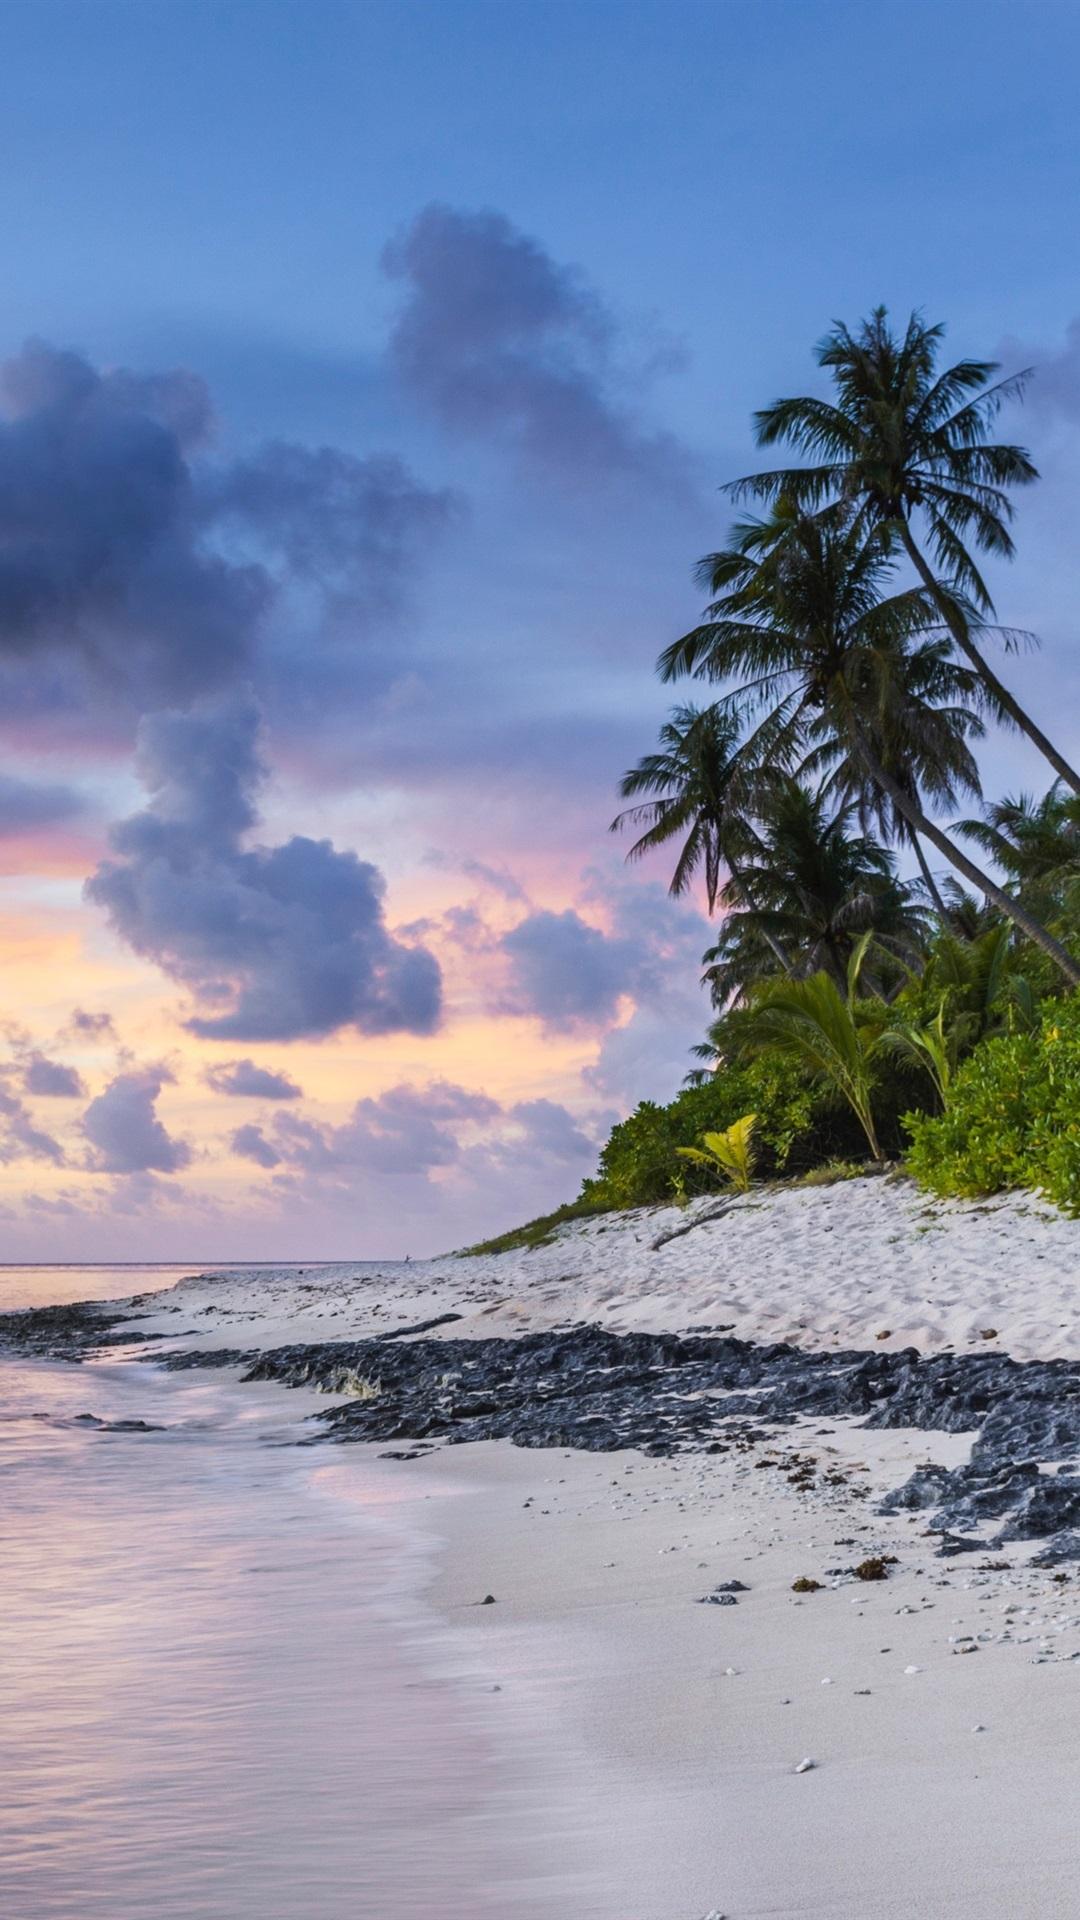 Beach Sunset Sea Palms Ocean Clouds 1080x1920 Iphone 8 7